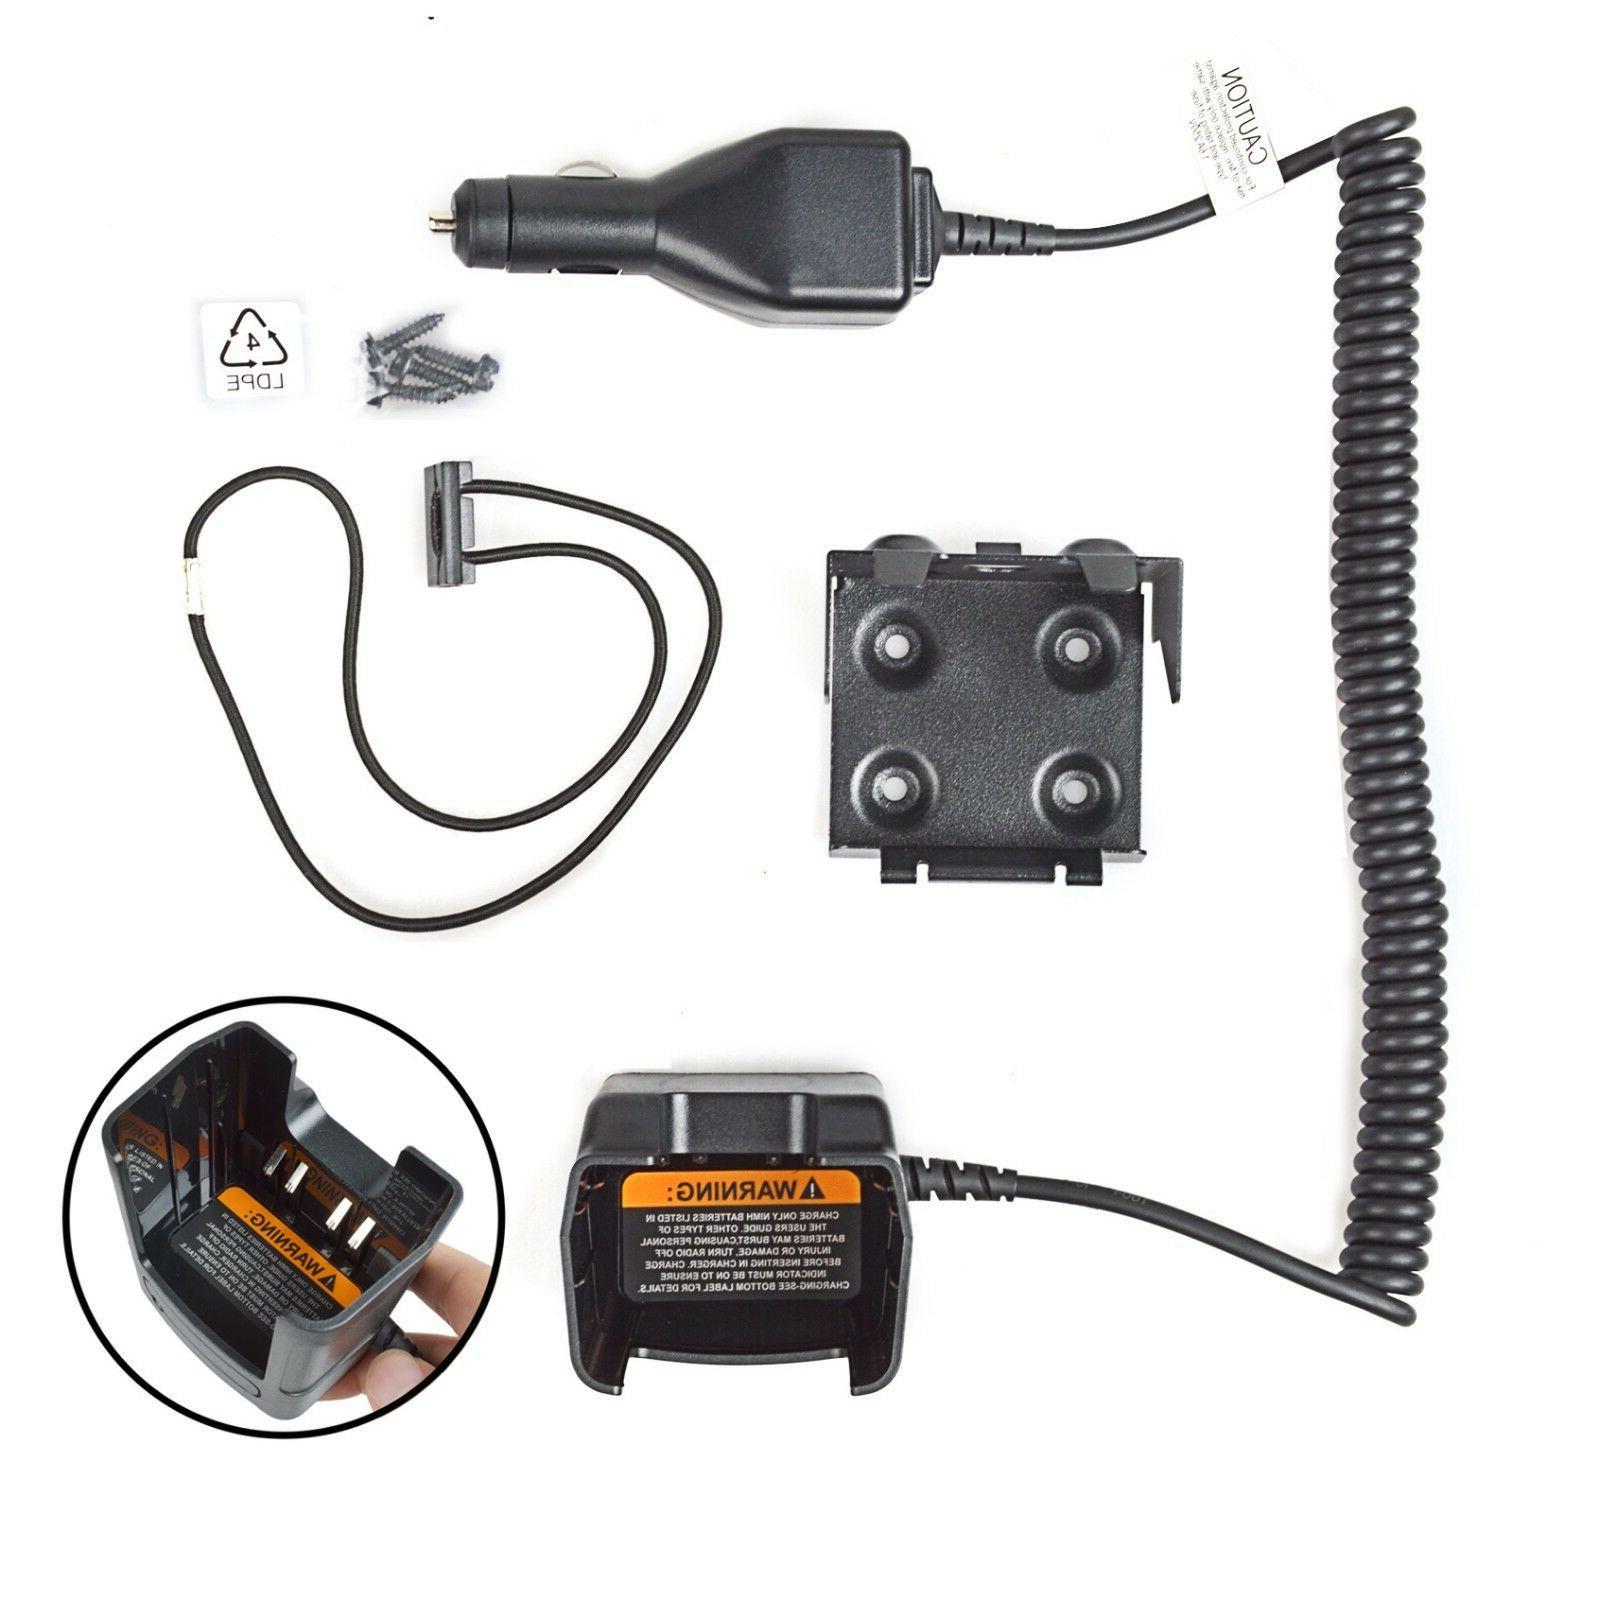 1-pk Rapid Charger For Motorola Radio HT750 HT1250 GP328 GP340 GP380 GP338 110V